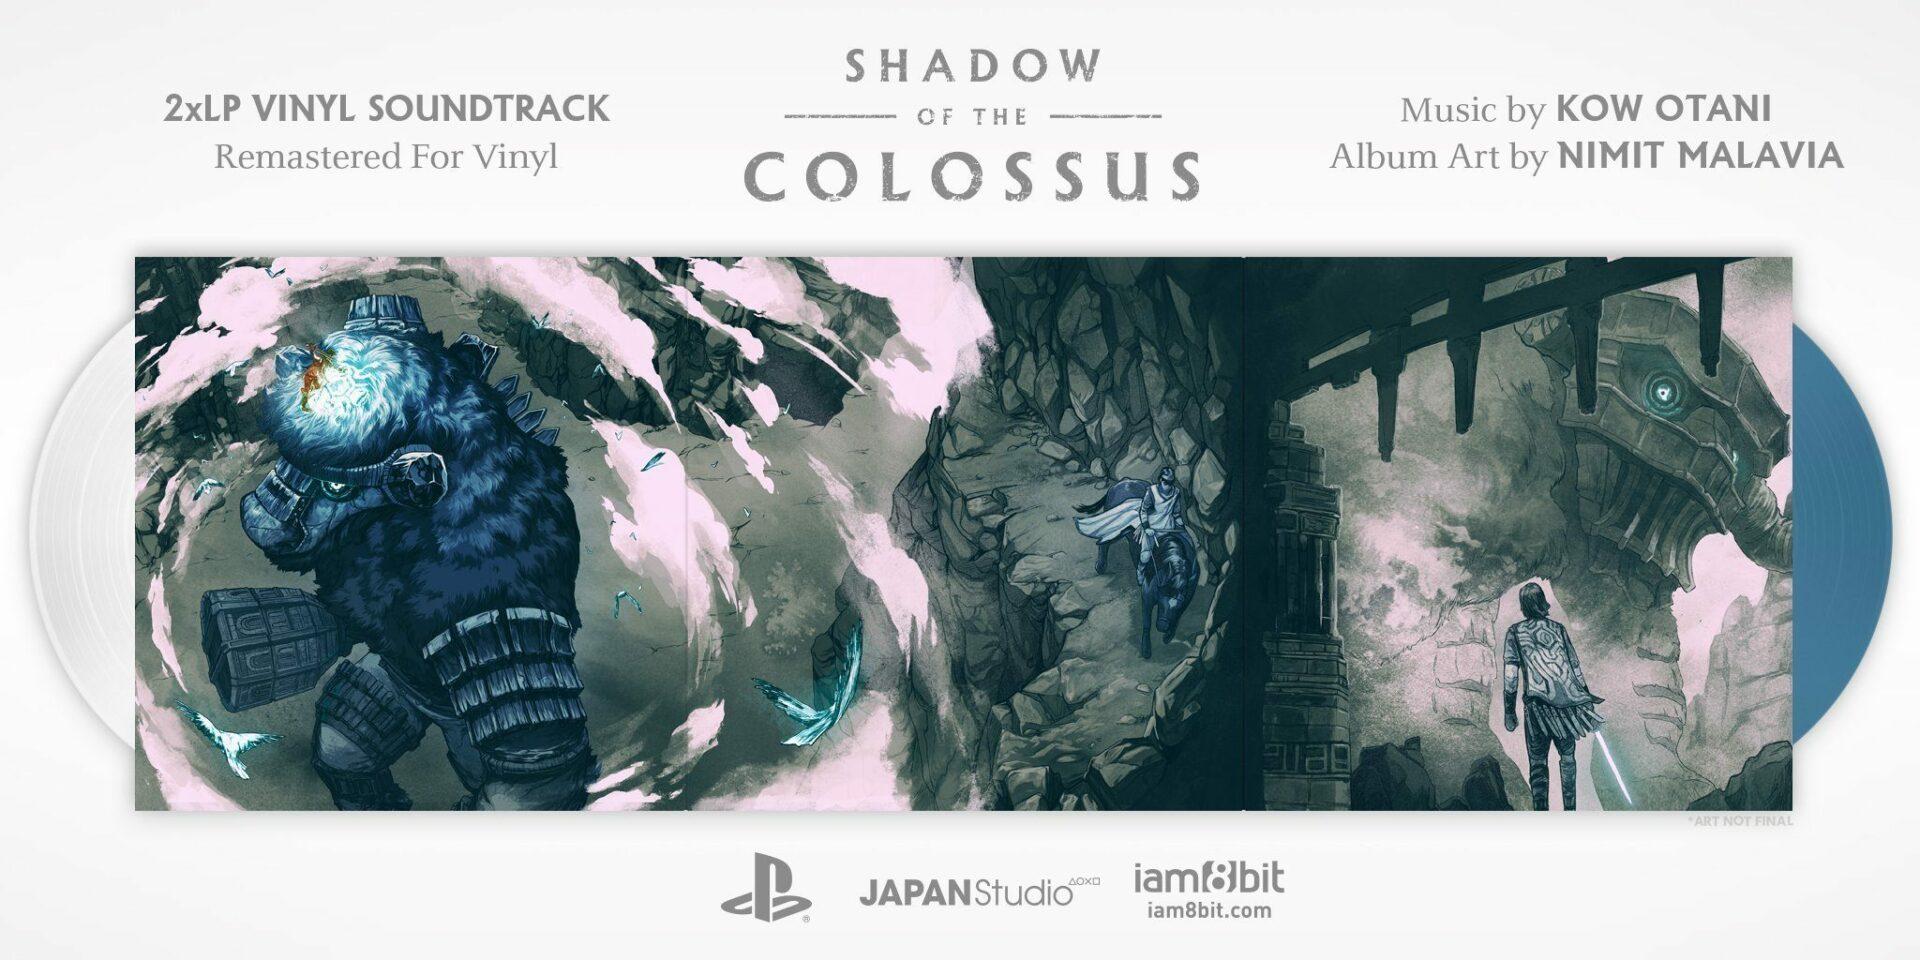 02-Shadow of the Colossus-vinyl_be94a041-c692-47fd-a607-0c1e448c173b